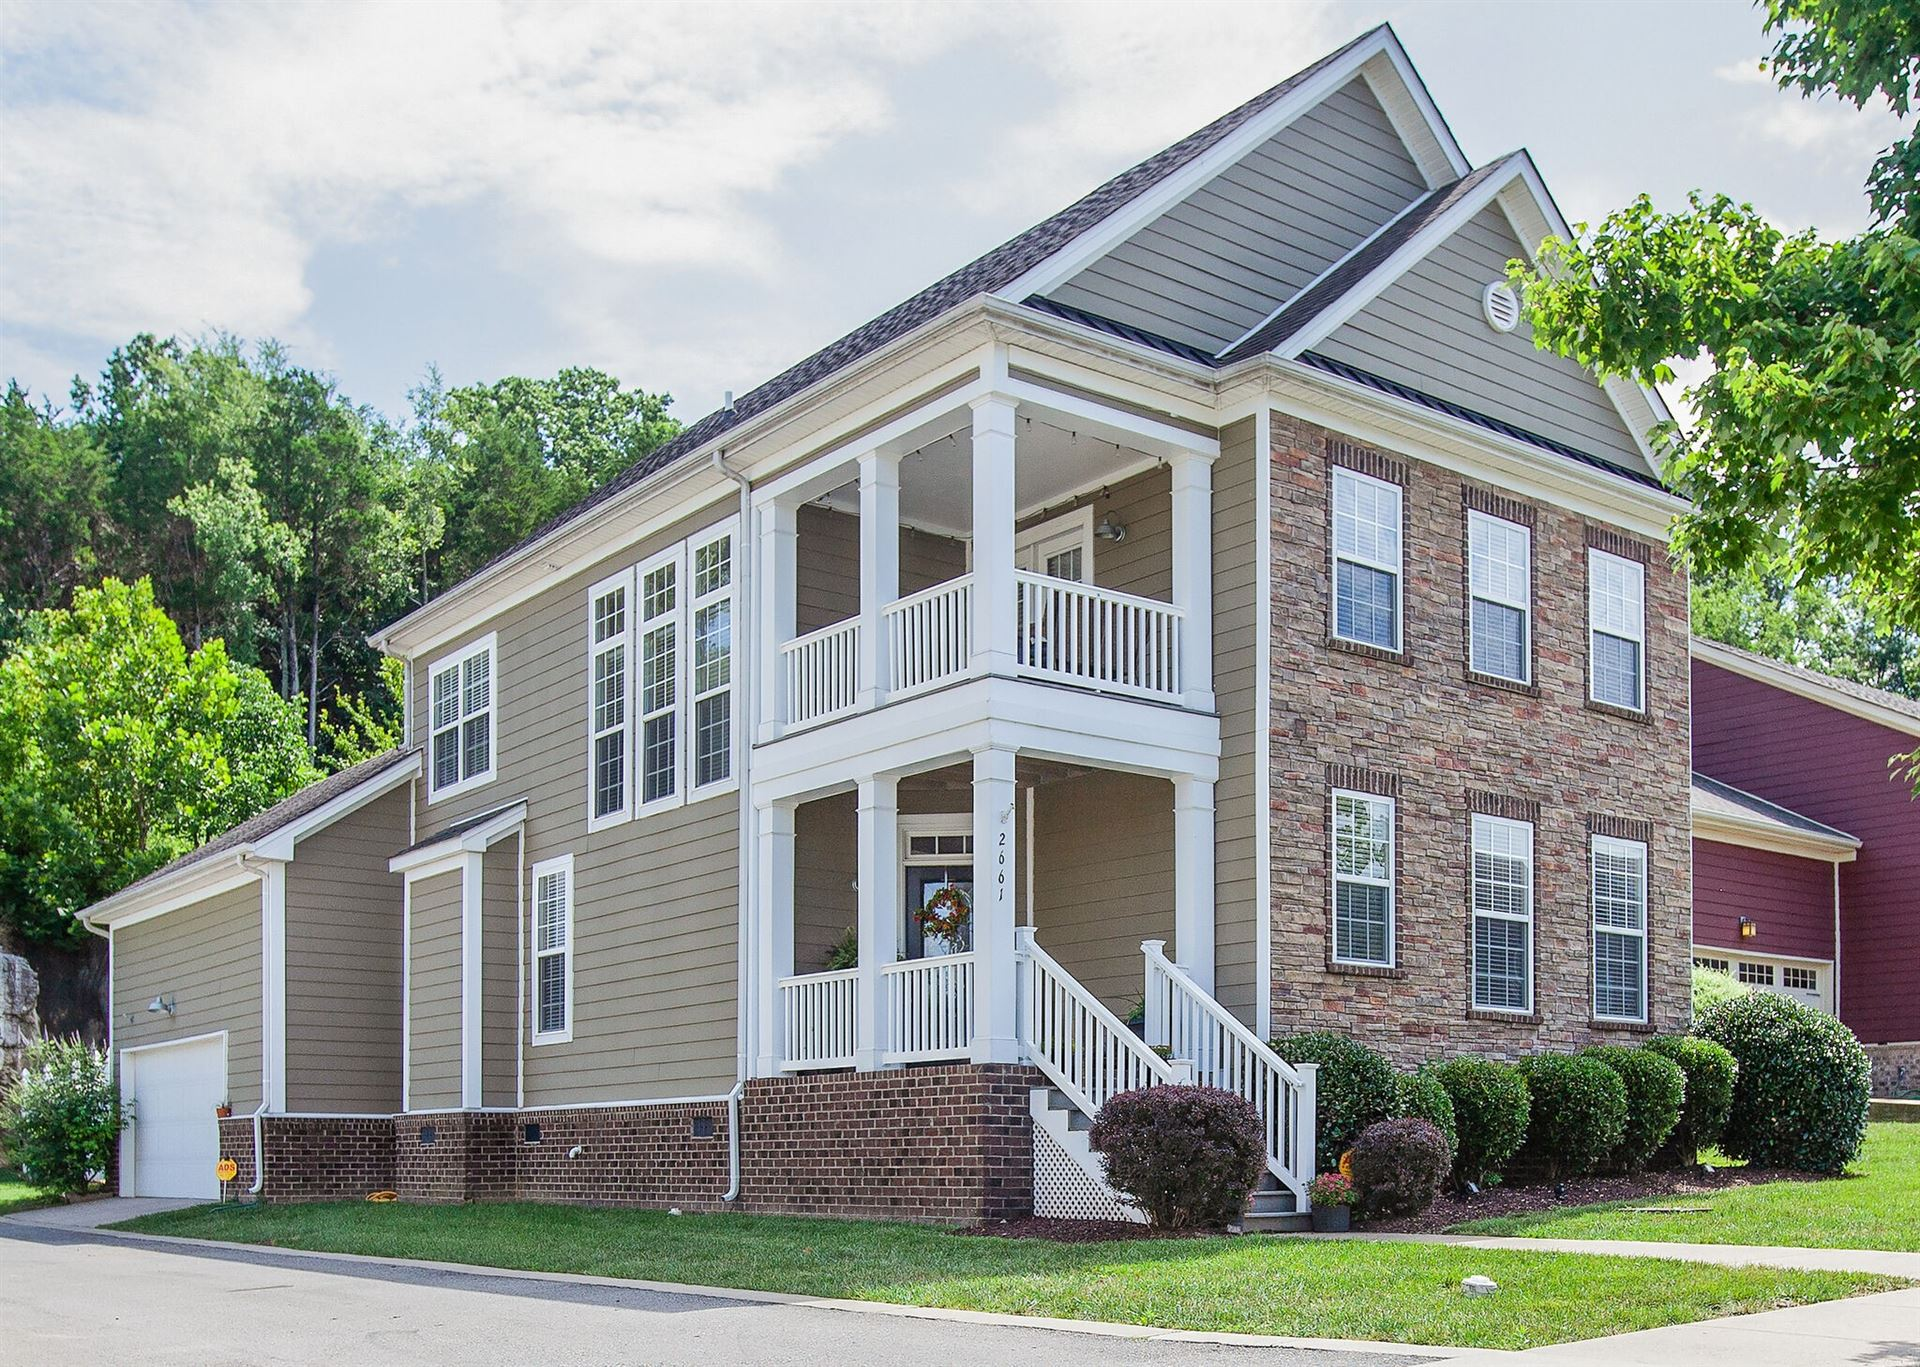 2661 Avery Park Dr, Nashville, TN 37211 - MLS#: 2173316